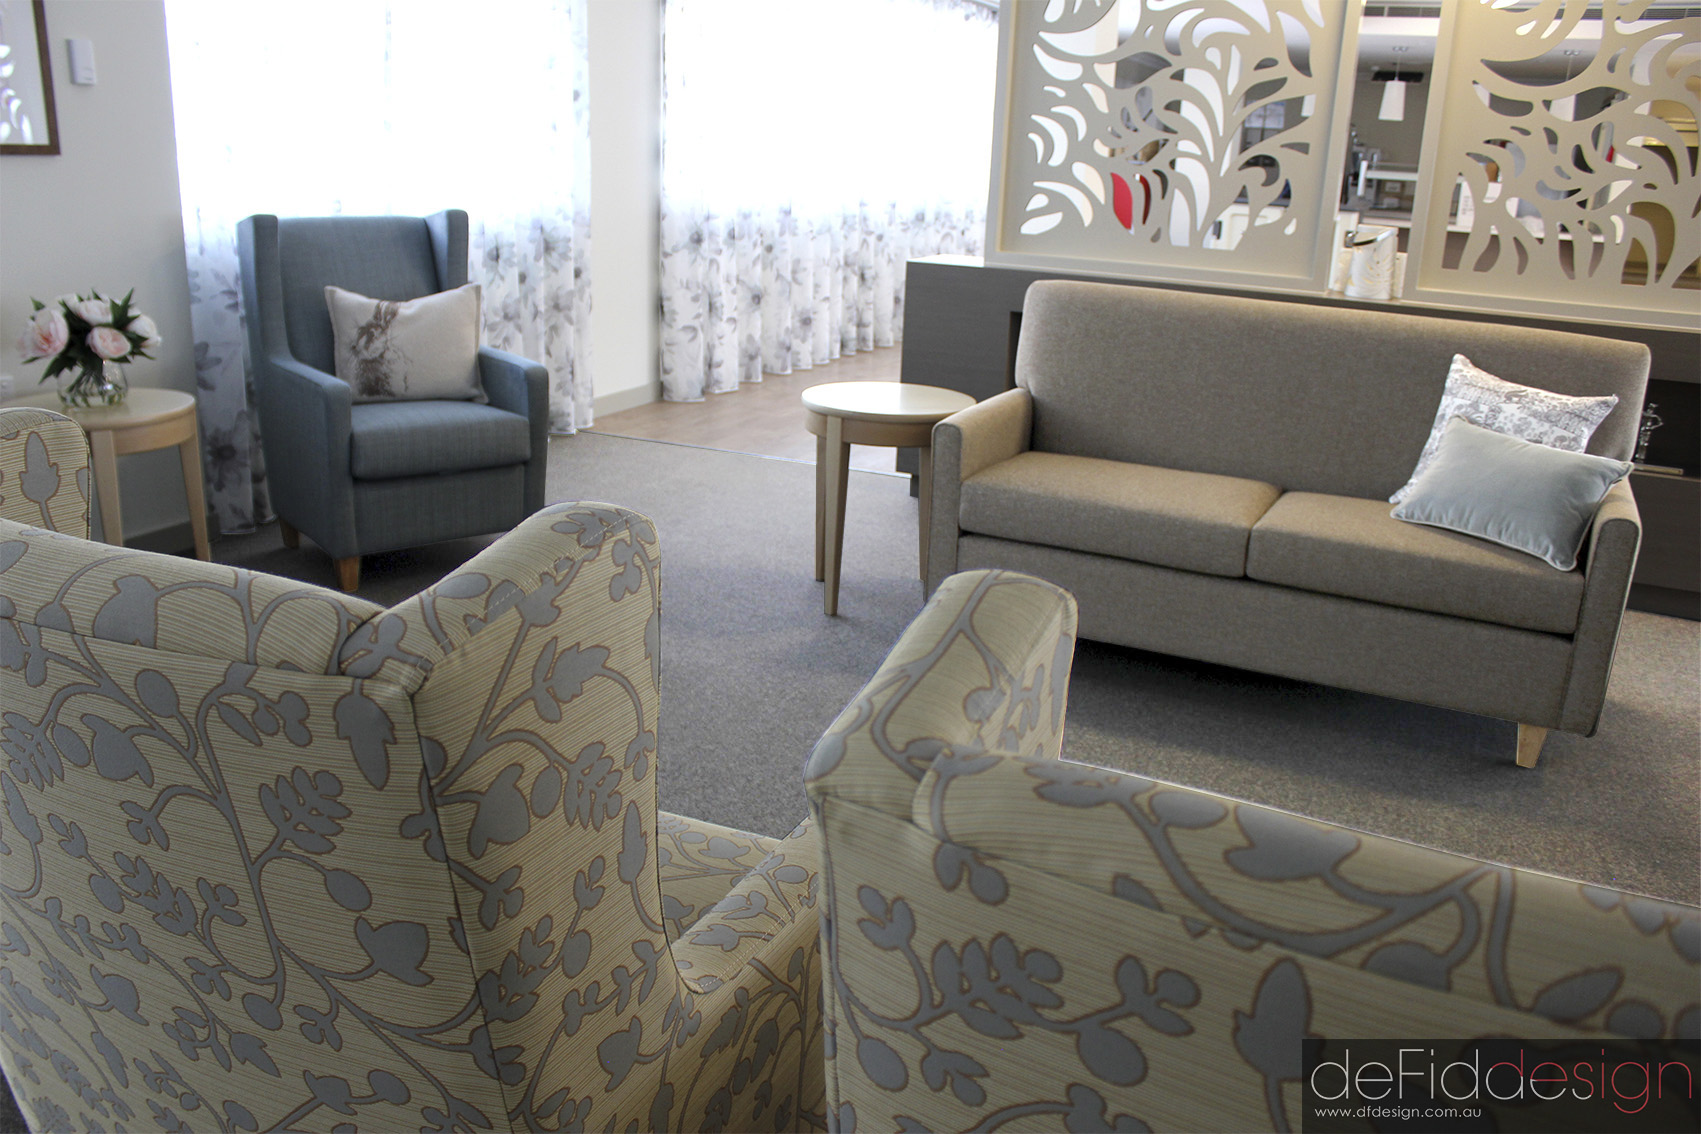 IMG_0647 edit sofa floor lighten watermarked.jpg